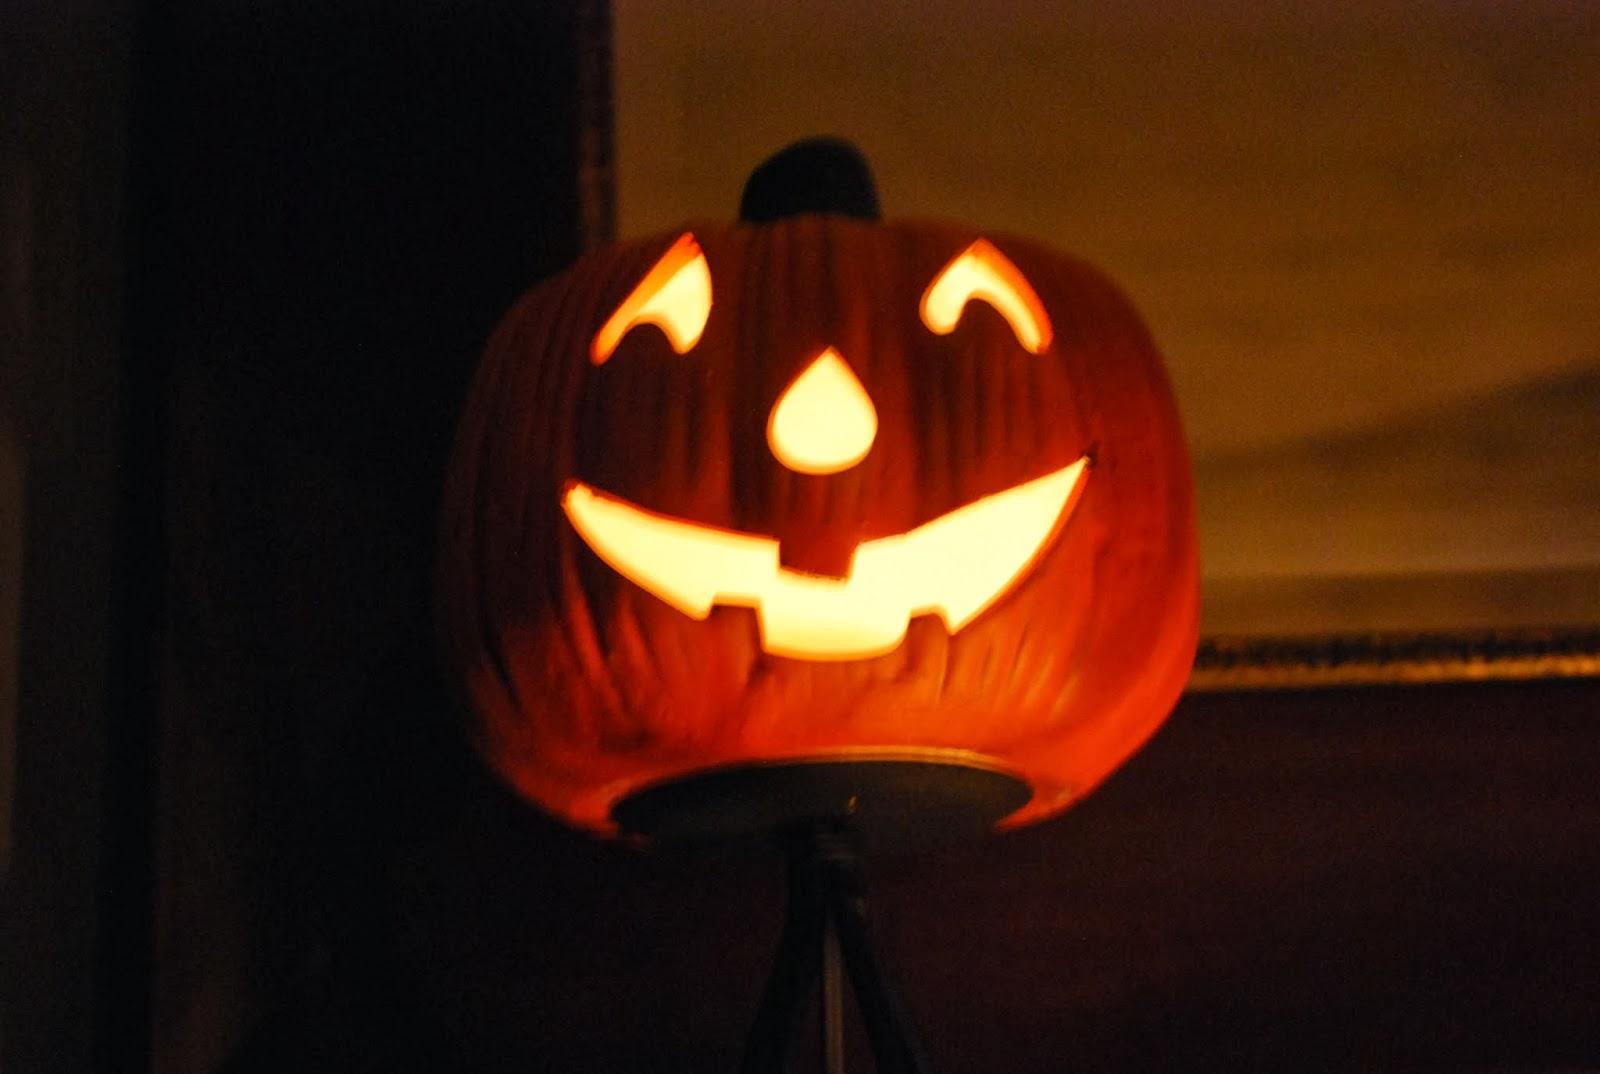 to wear - So happy pinteresting halloween video